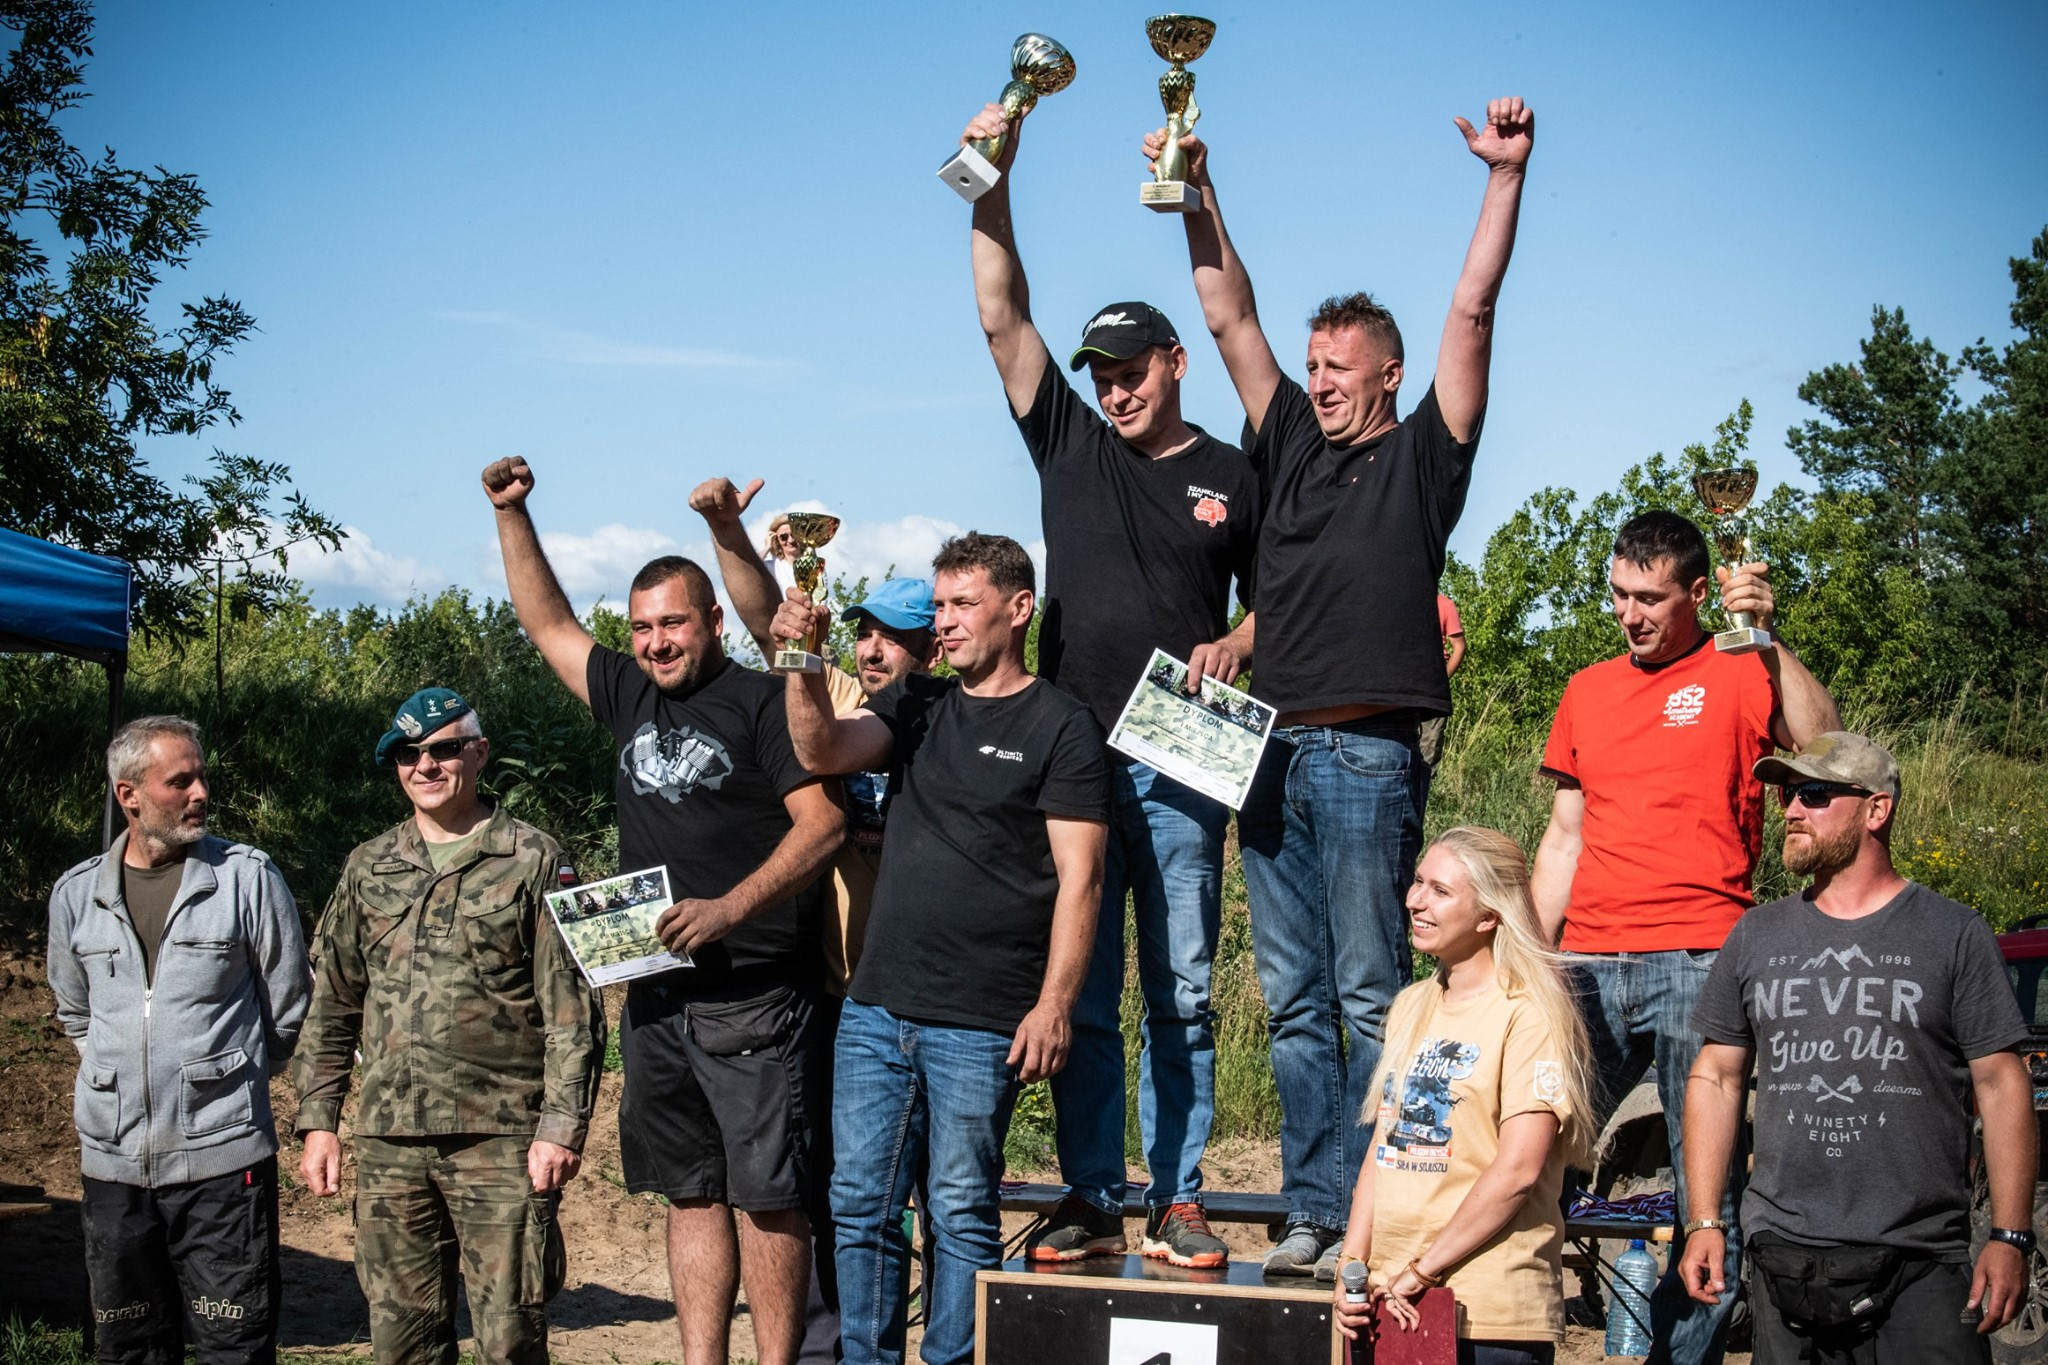 http://m.wm.pl/2019/07/orig/quady-triumfatorzy-564395.jpg